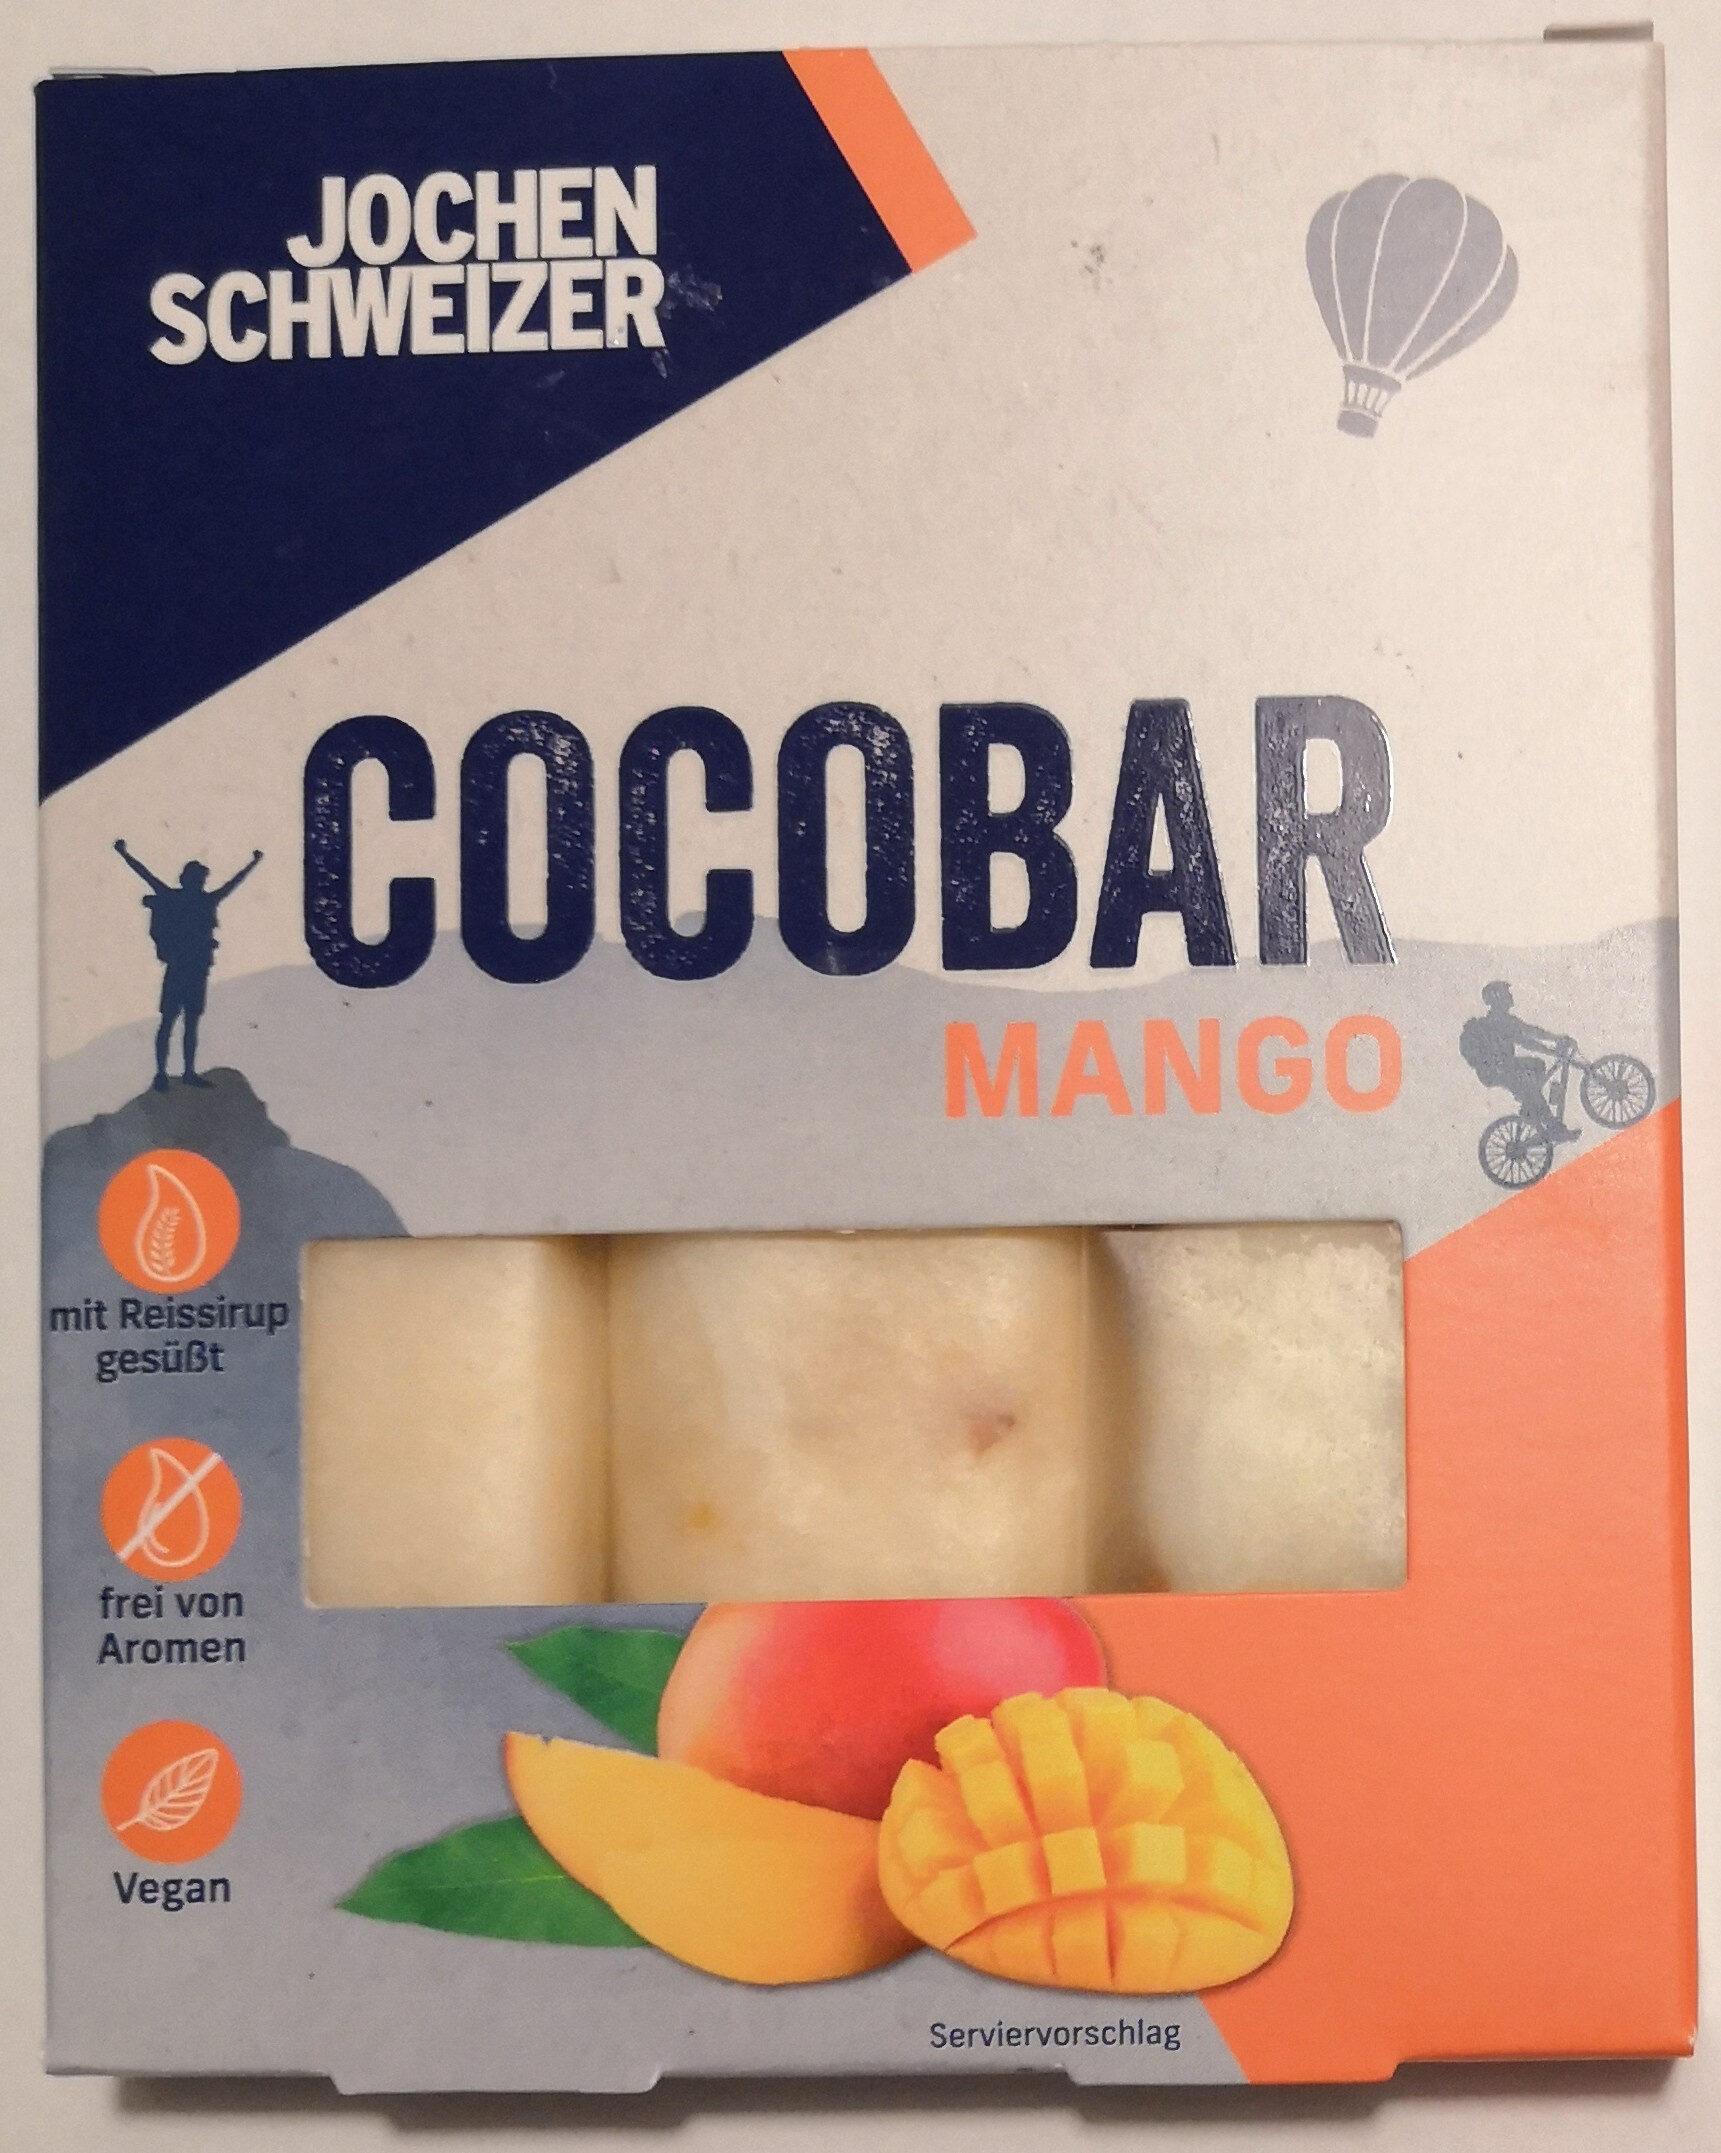 Jochen Schweizer Cocobar Mango - Product - de